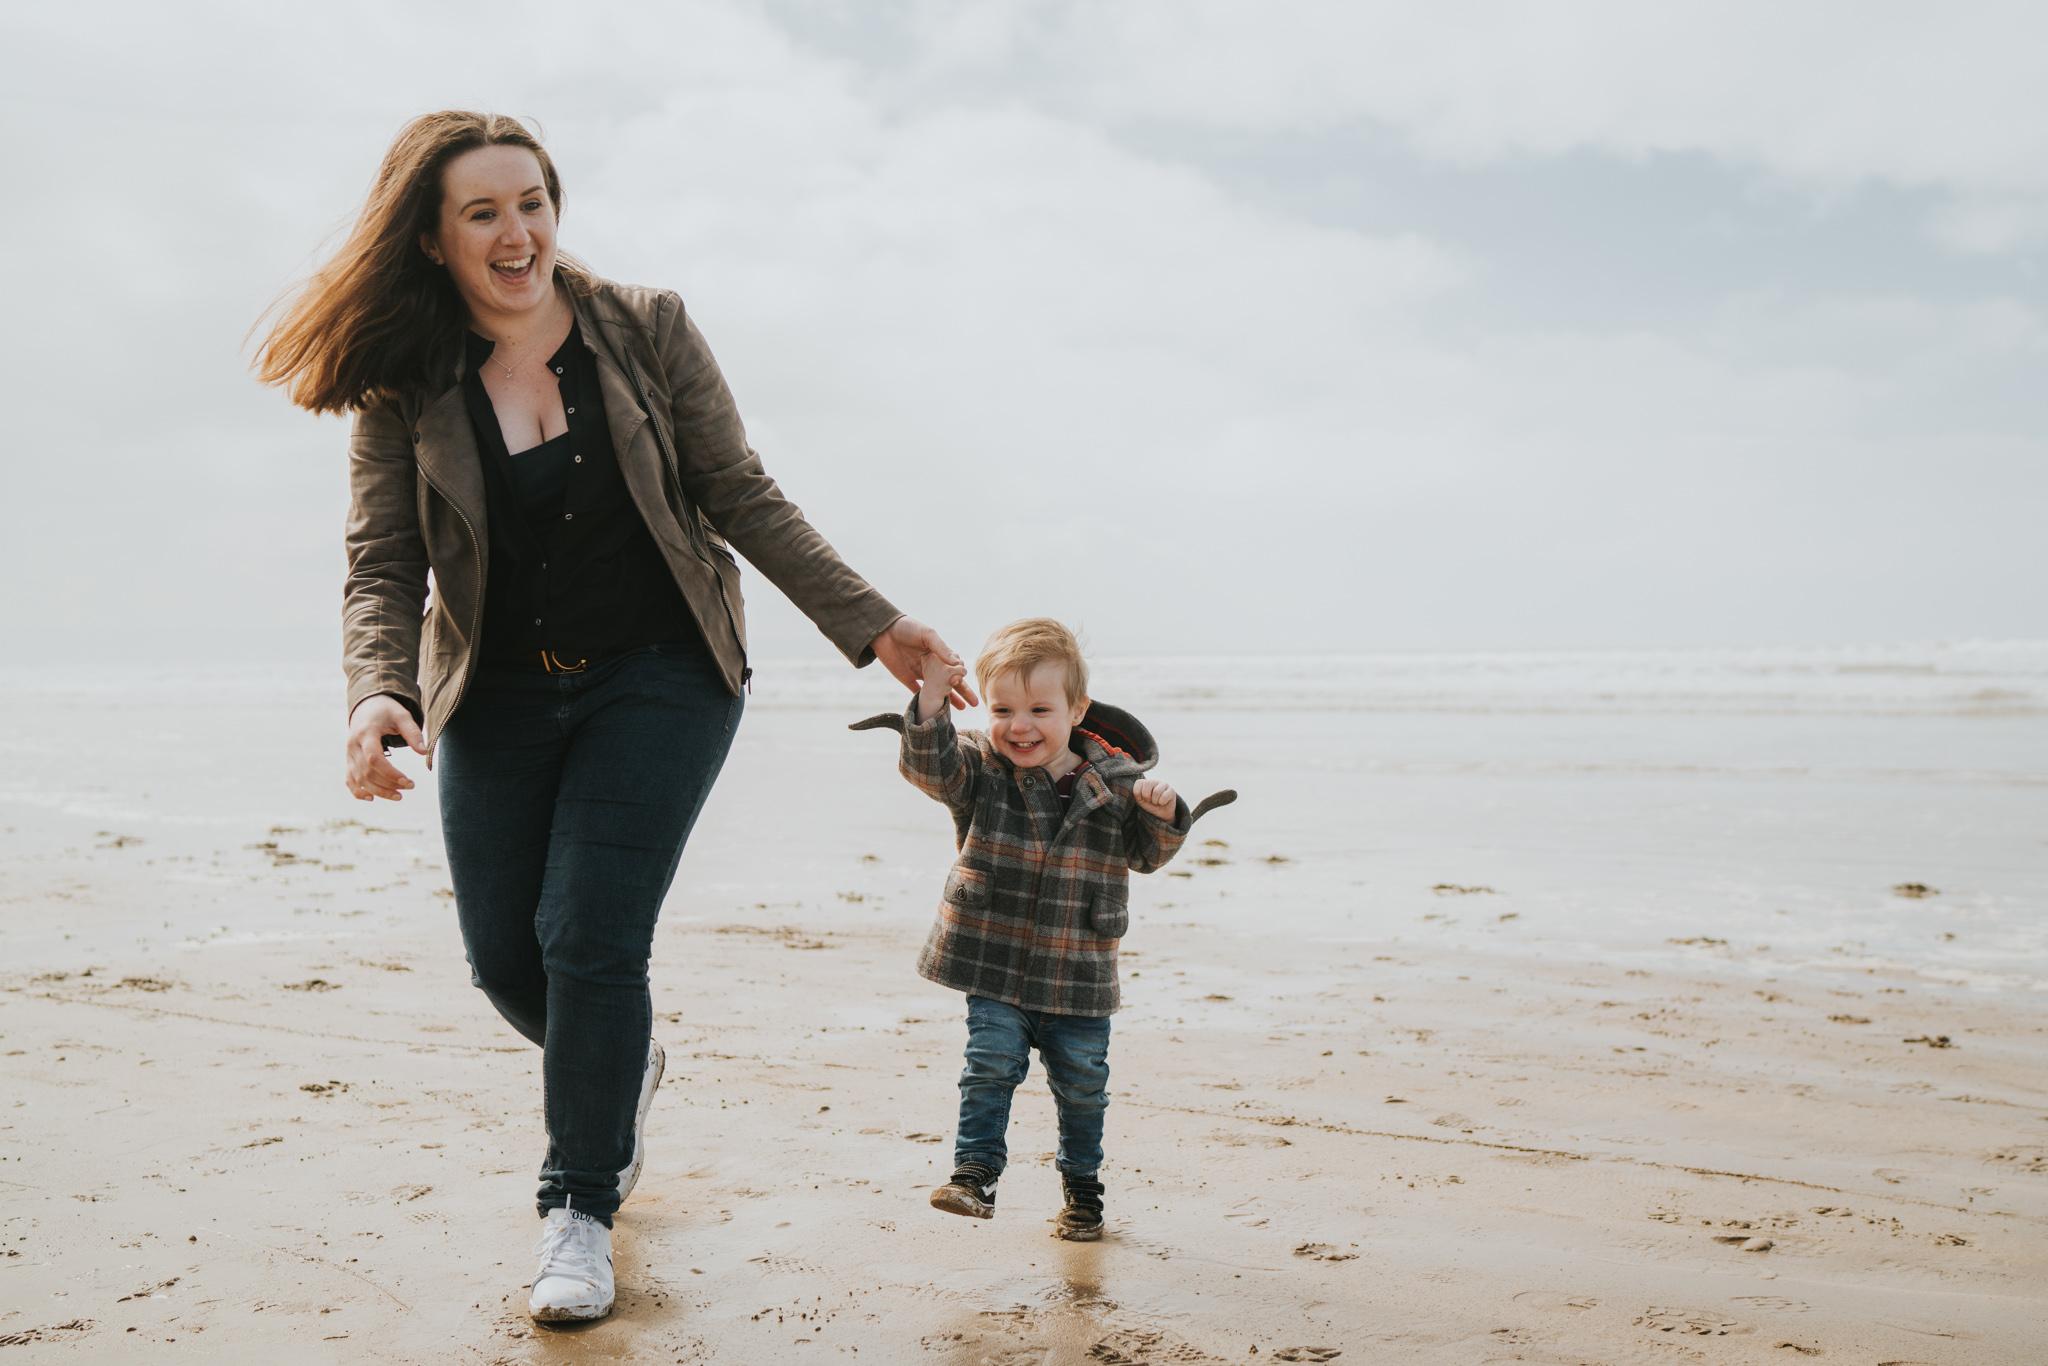 beach-family-session-westward-ho-north-devon-grace-elizabeth-devon-family-wedding-photographer-essex-devon-norfolk (16 of 43).jpg